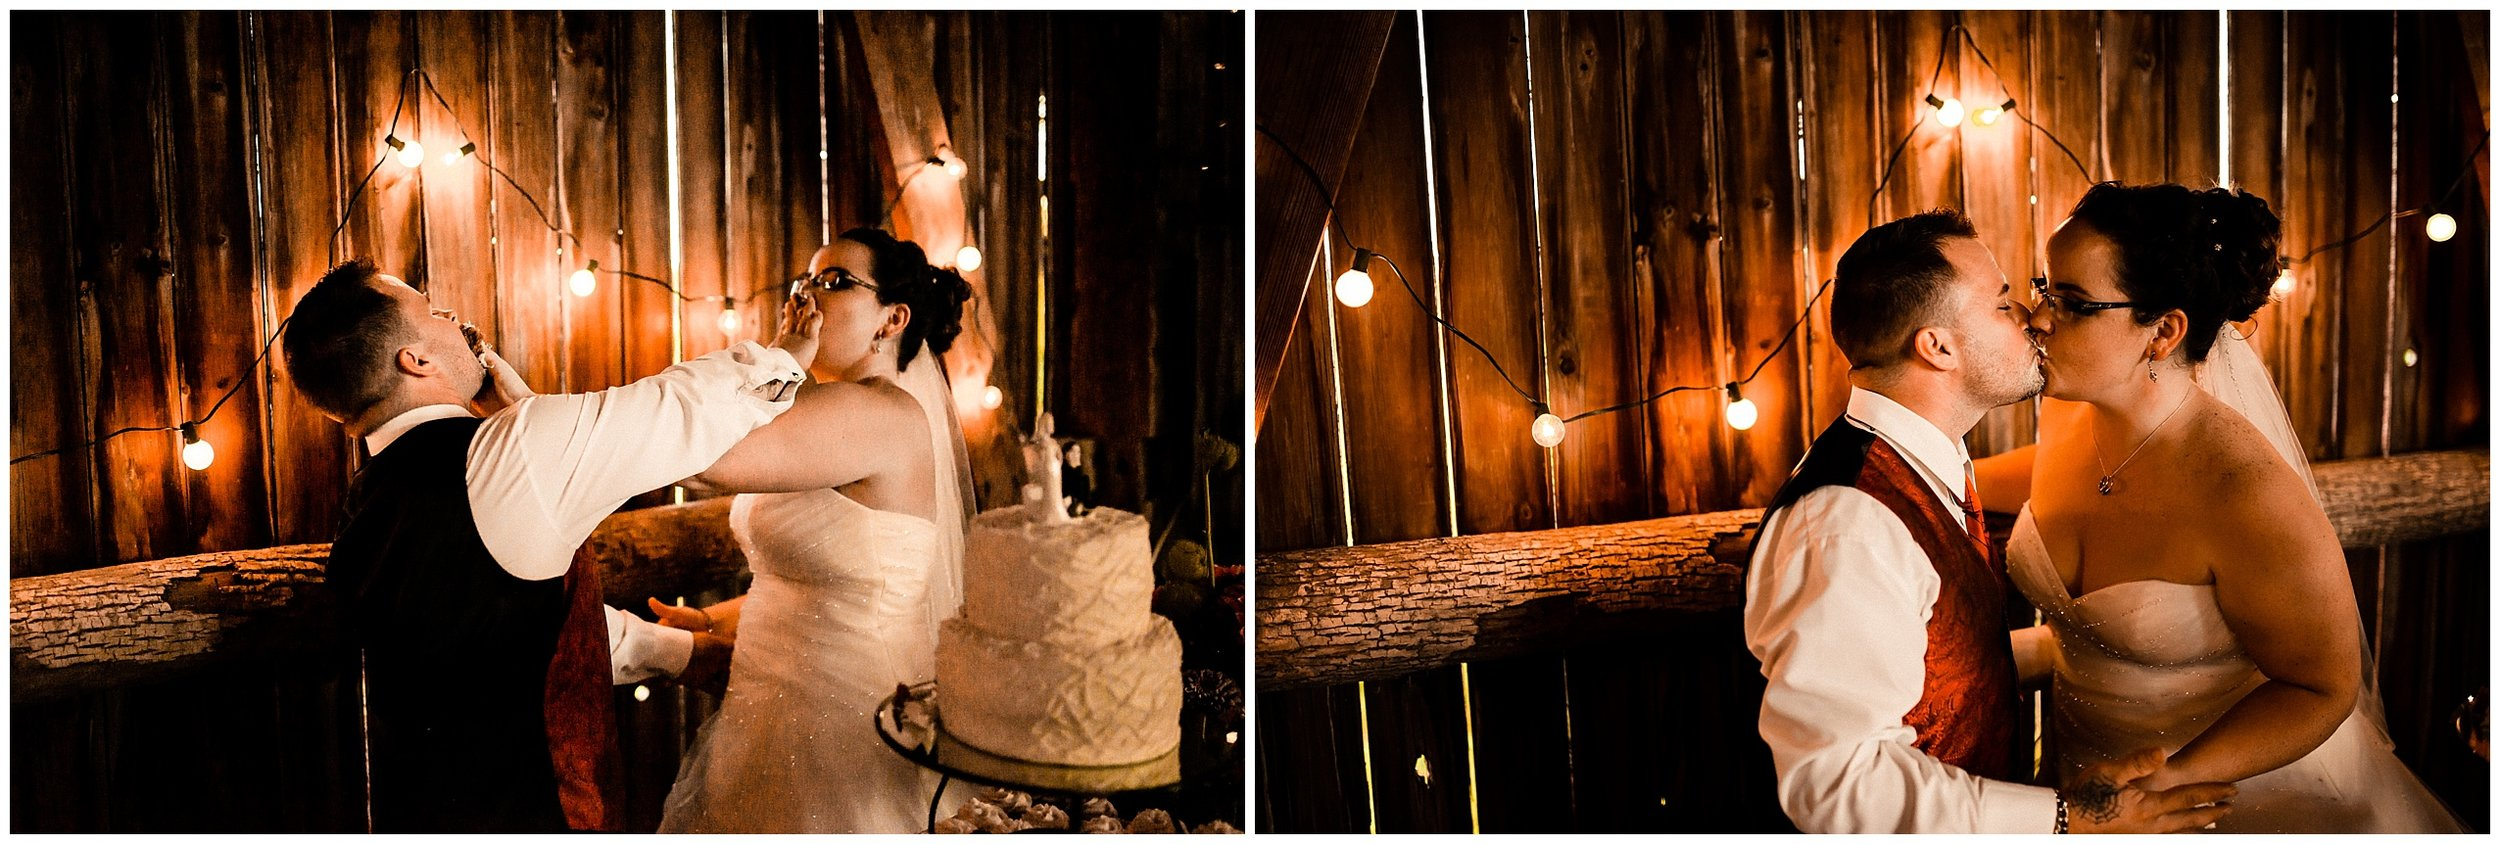 Micheal + Chelsie   Just Married #kyleepaigephotography_1608.jpg